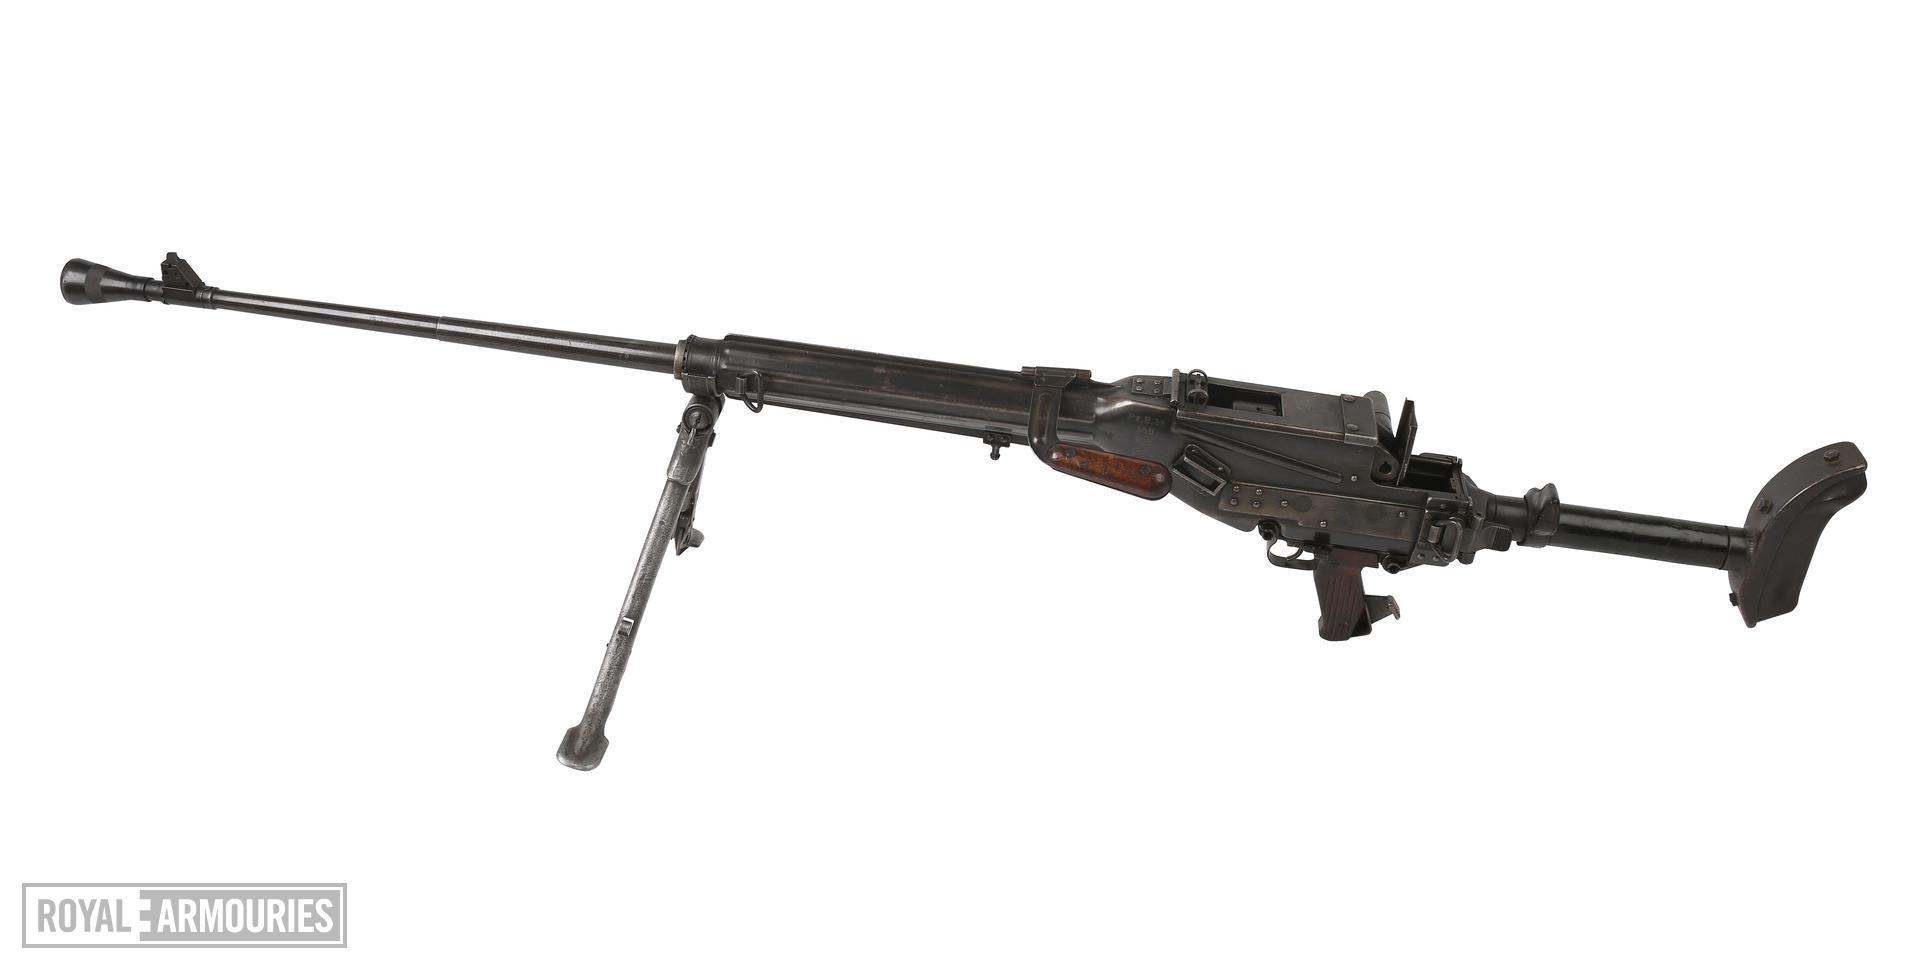 PR.1715 Centrefire bolt-action anti-tank rifle